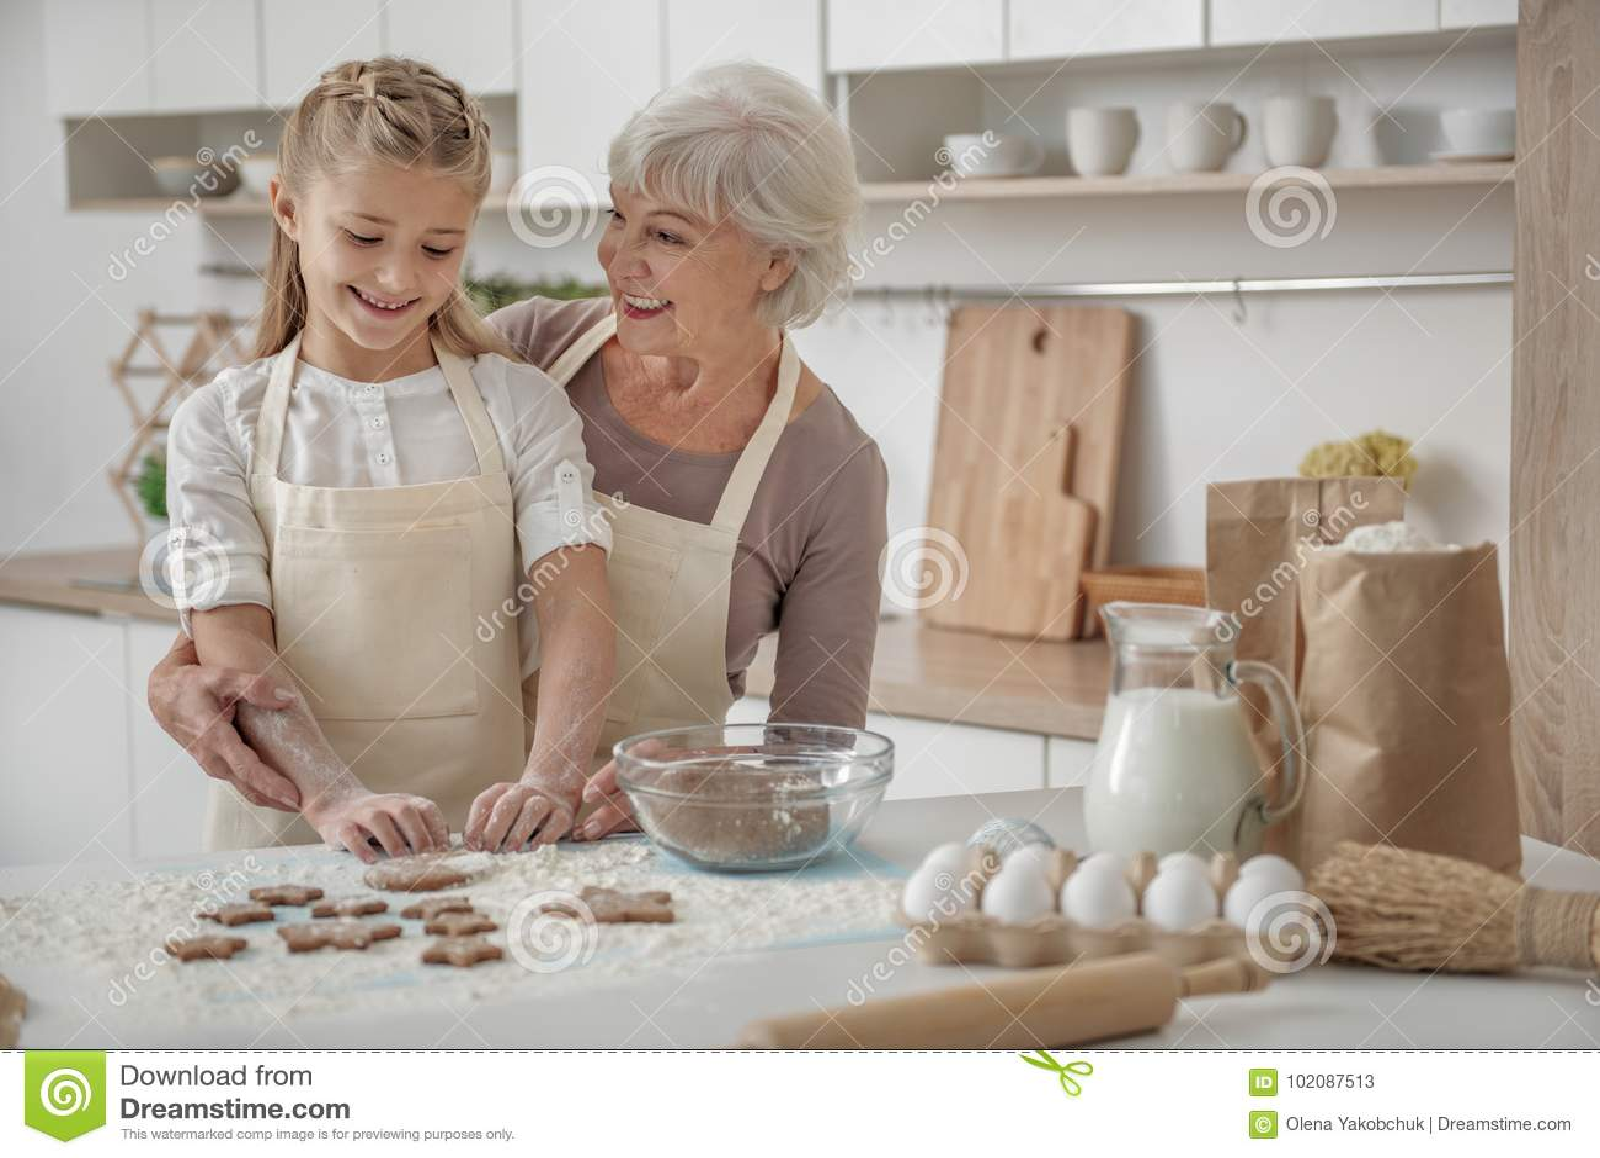 Photopositive. How children make cakes